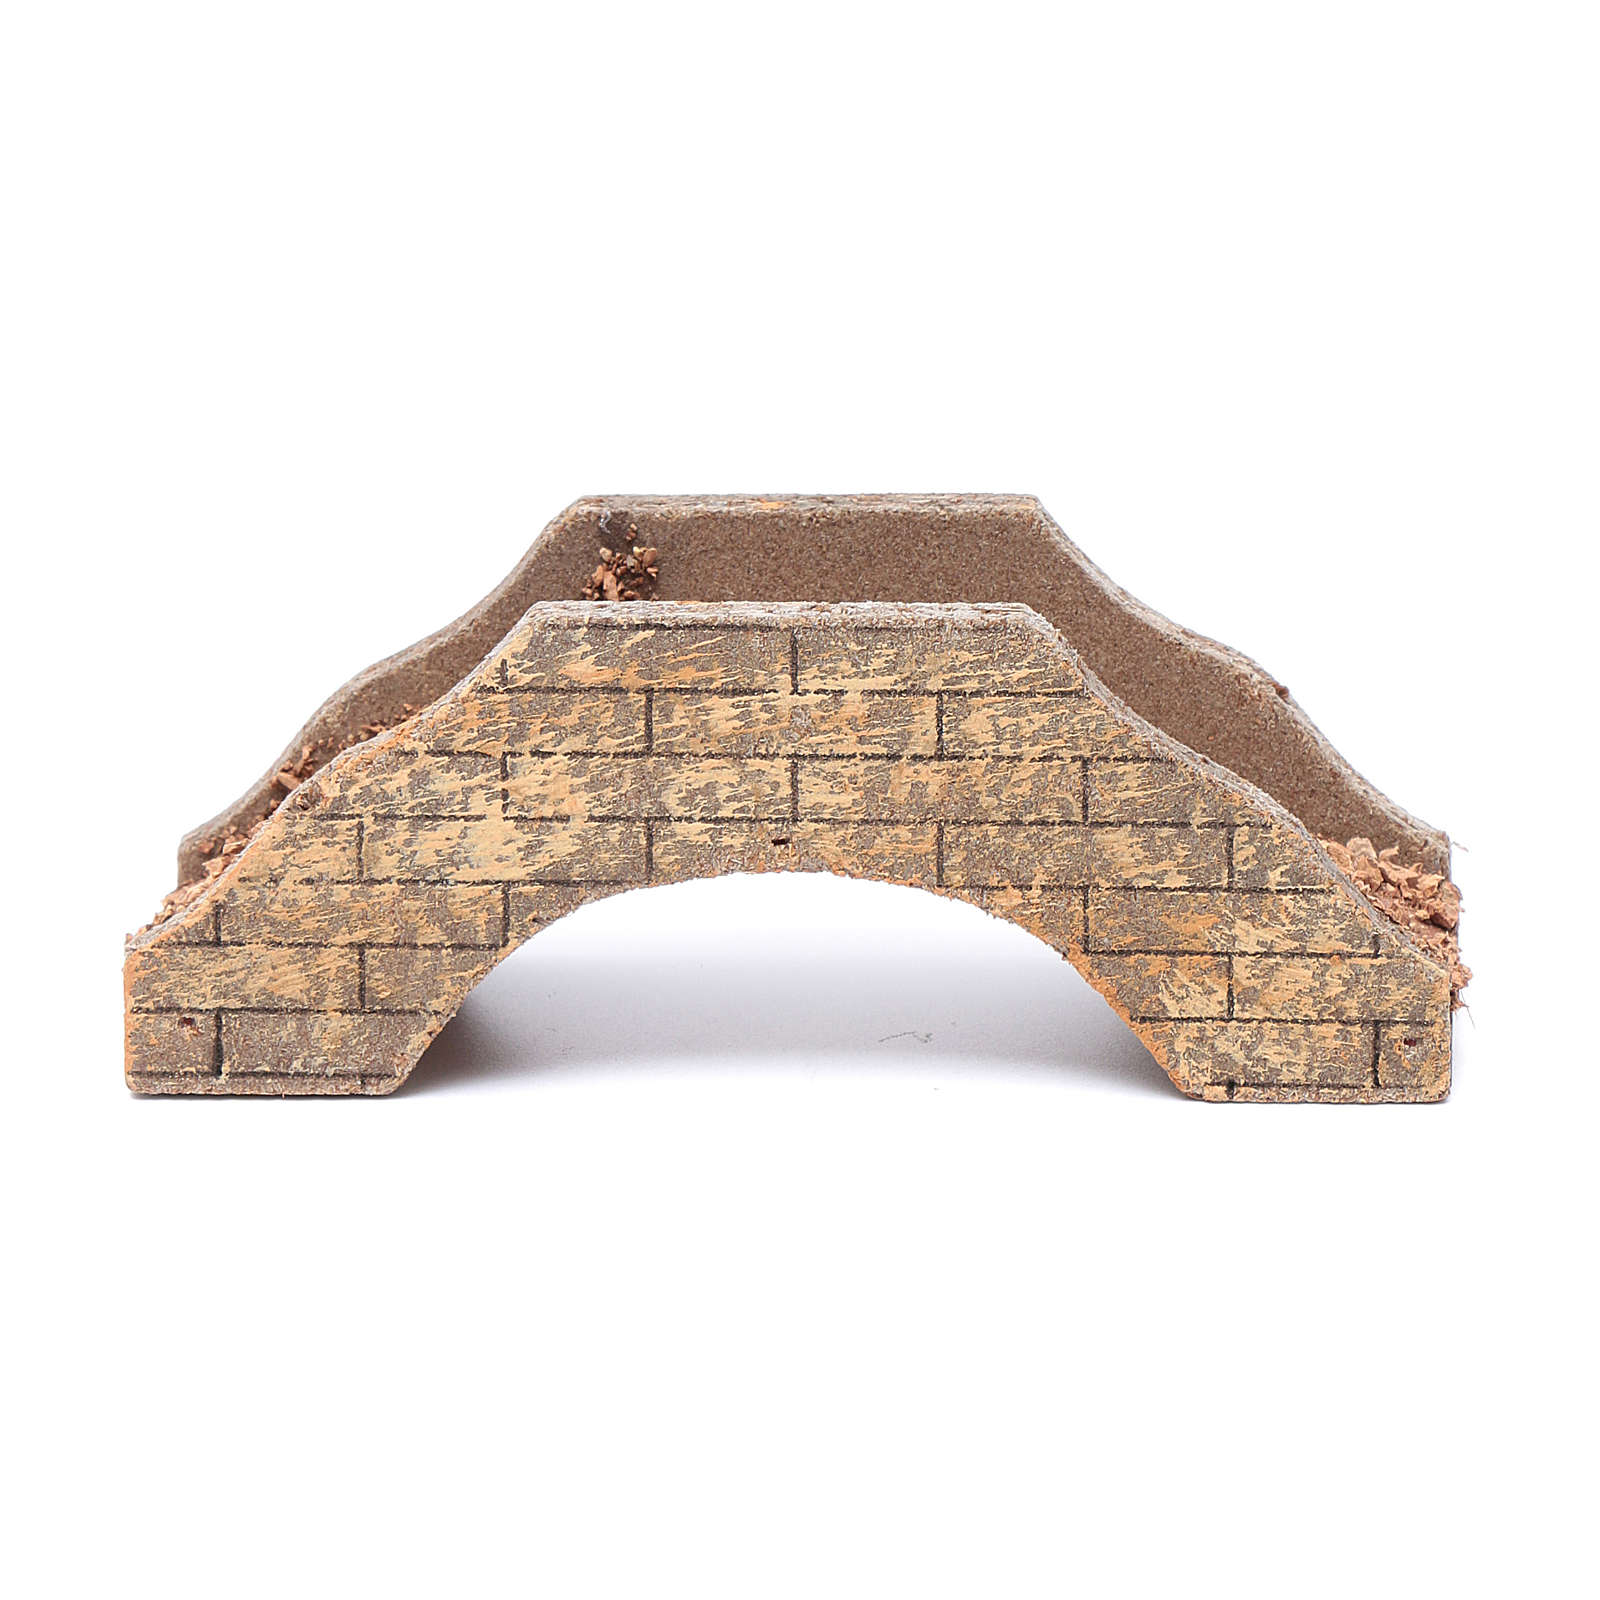 Nativity scene bridge in wood 5x15x6 cm 4